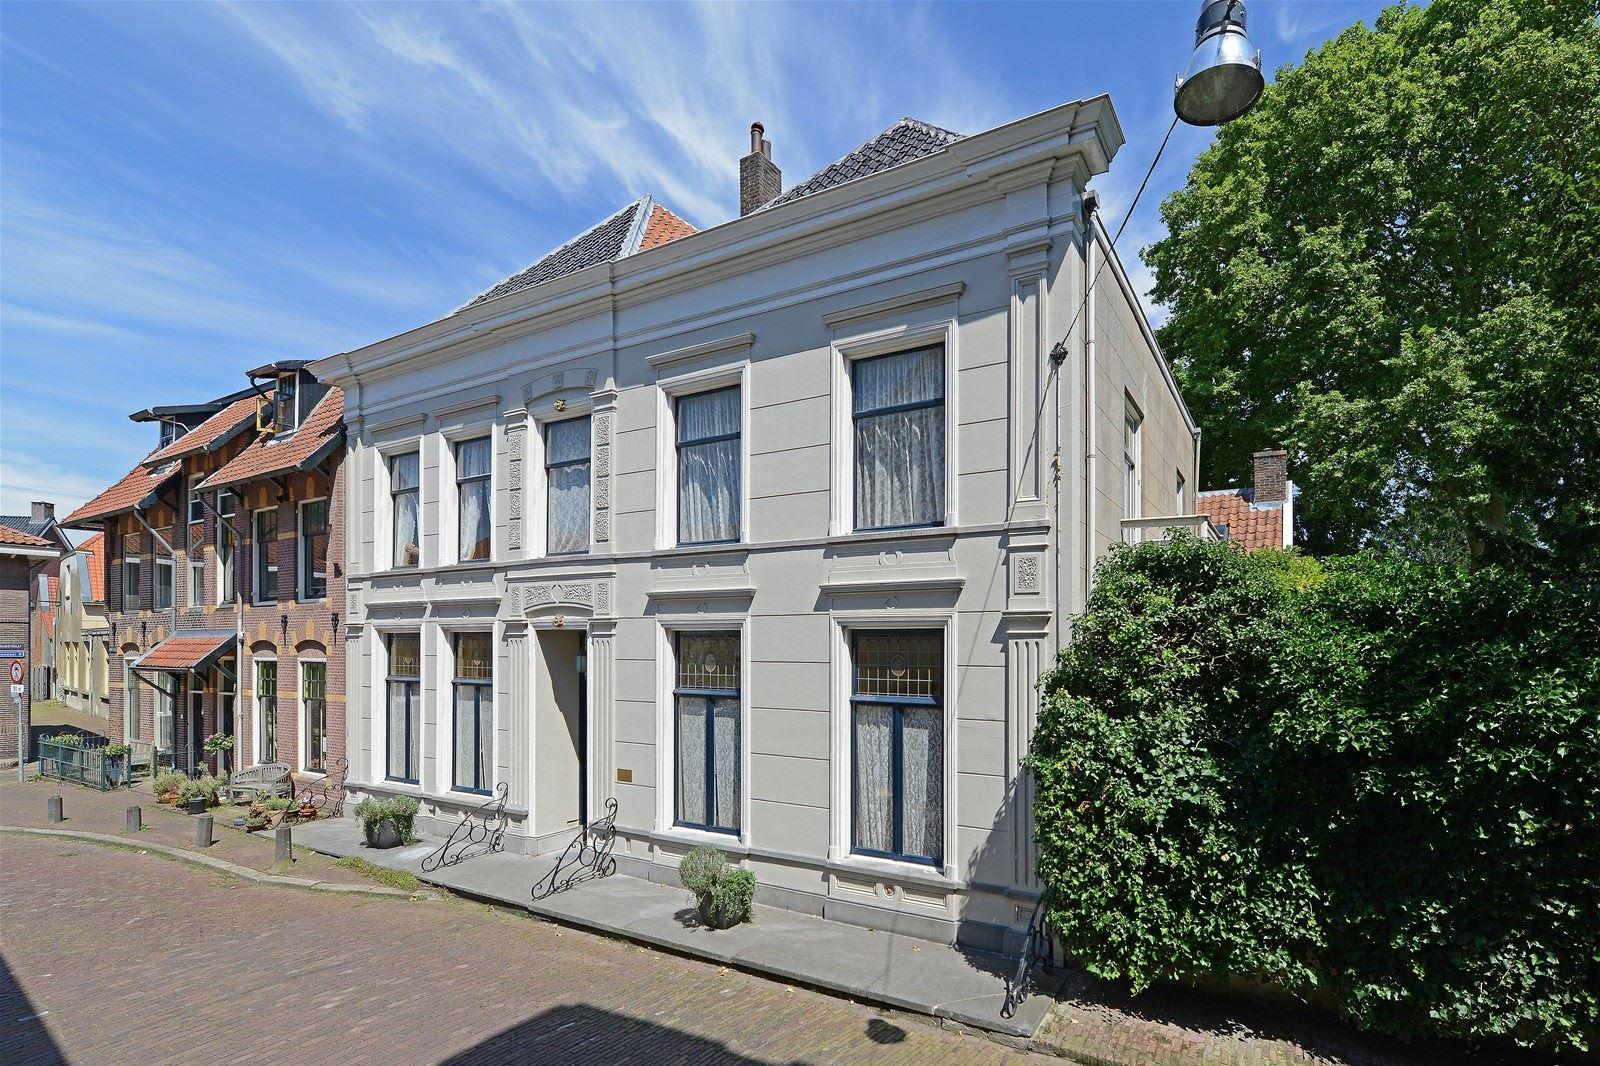 Stadstuin In Zaltbommel : Huis te koop kerkstraat eg zaltbommel funda